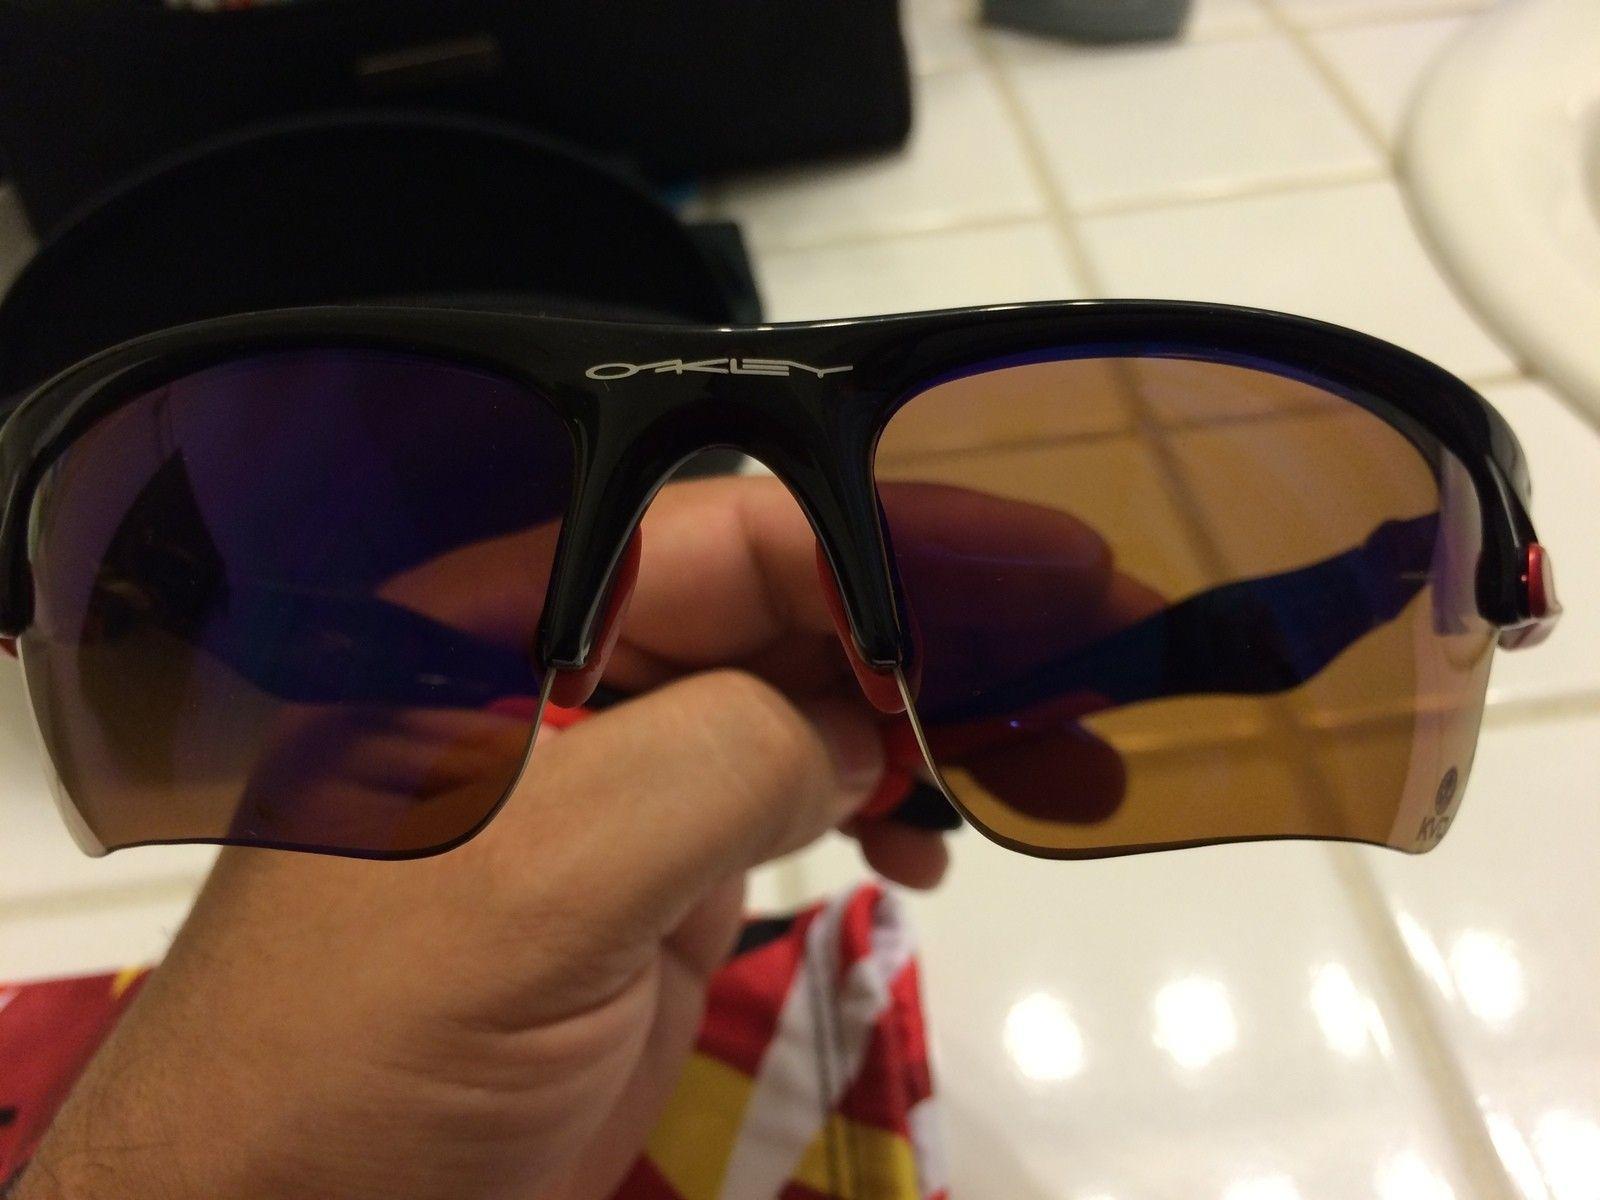 Fast Jacket - KVD Polarized - Under $99 - 2015-06-04 19.22.01.jpg